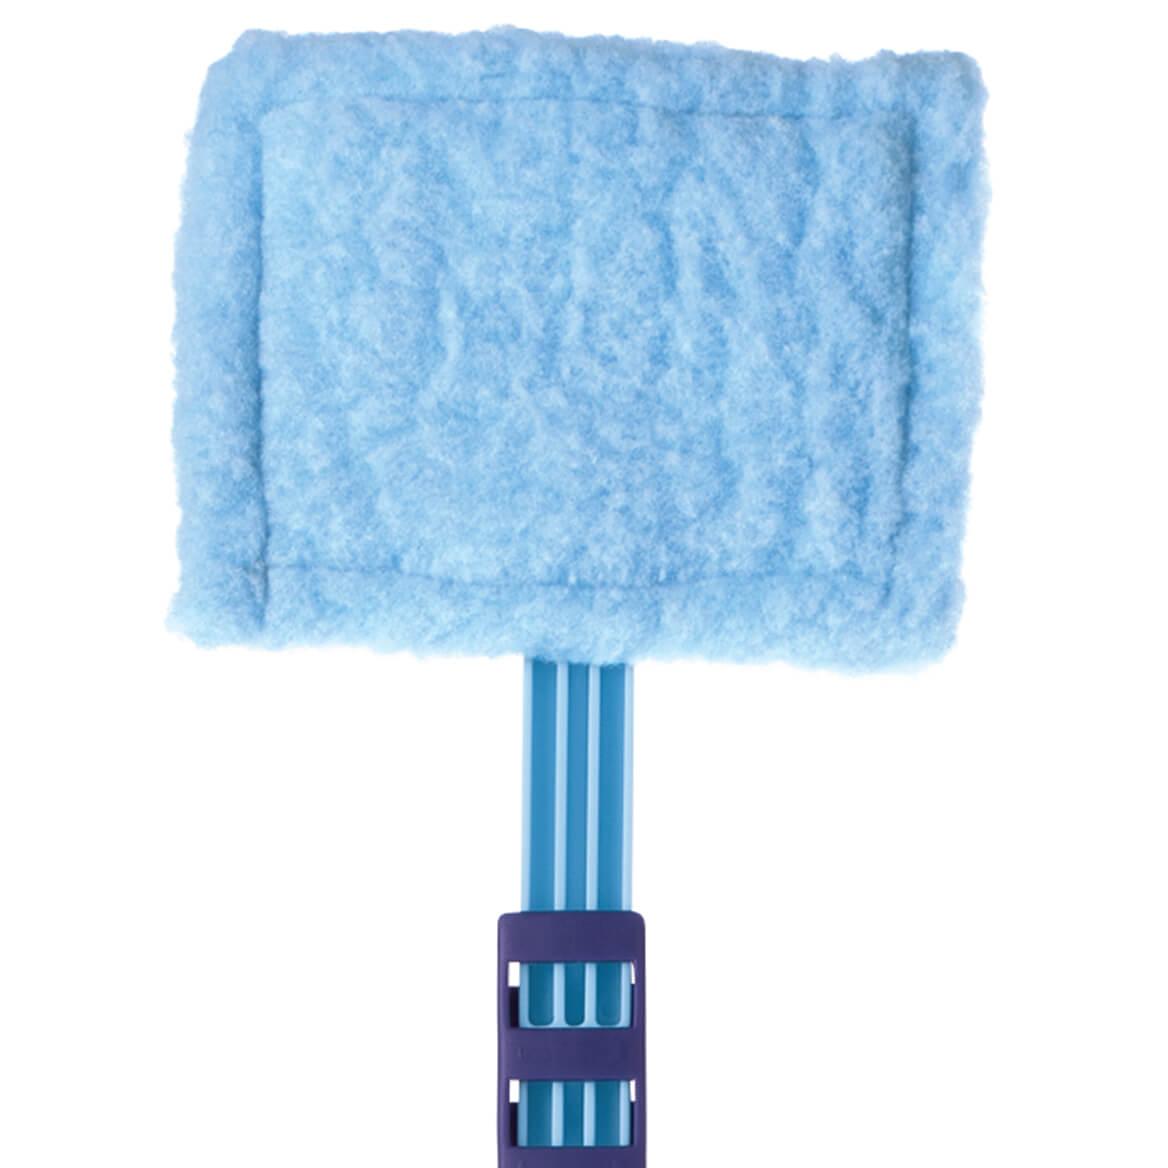 Microfiber Refill for Tub & Wall Scrubber